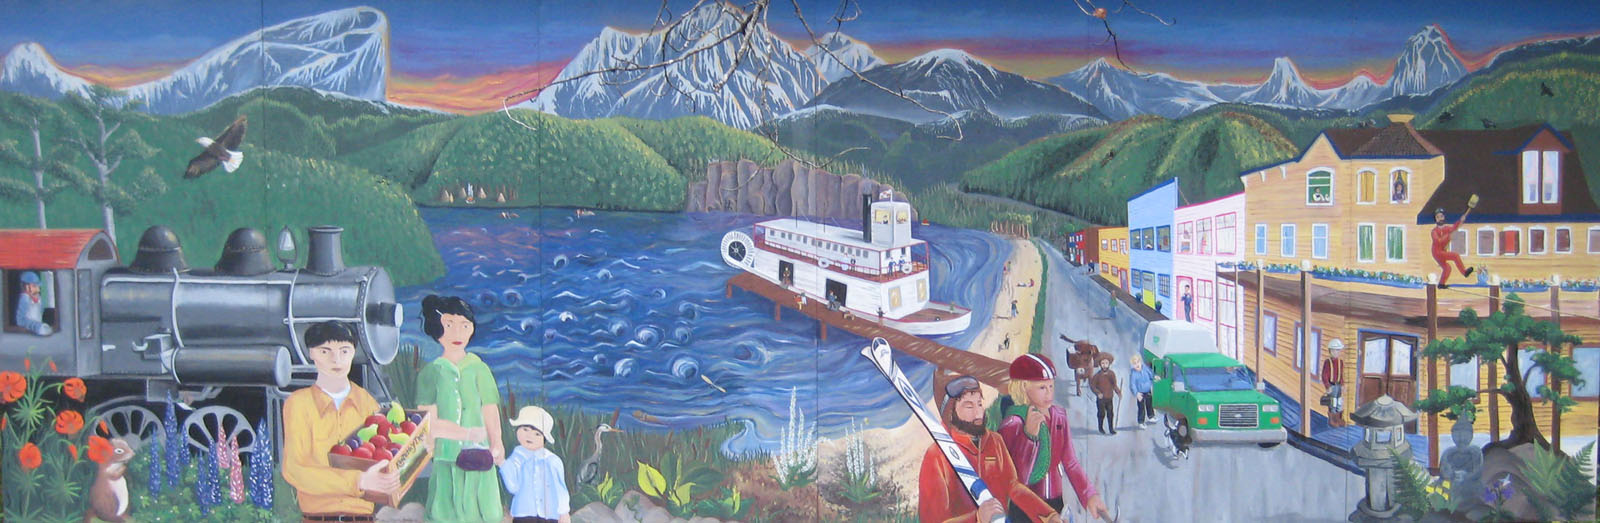 Springer Creek Mural - photo by Michelle Gordon